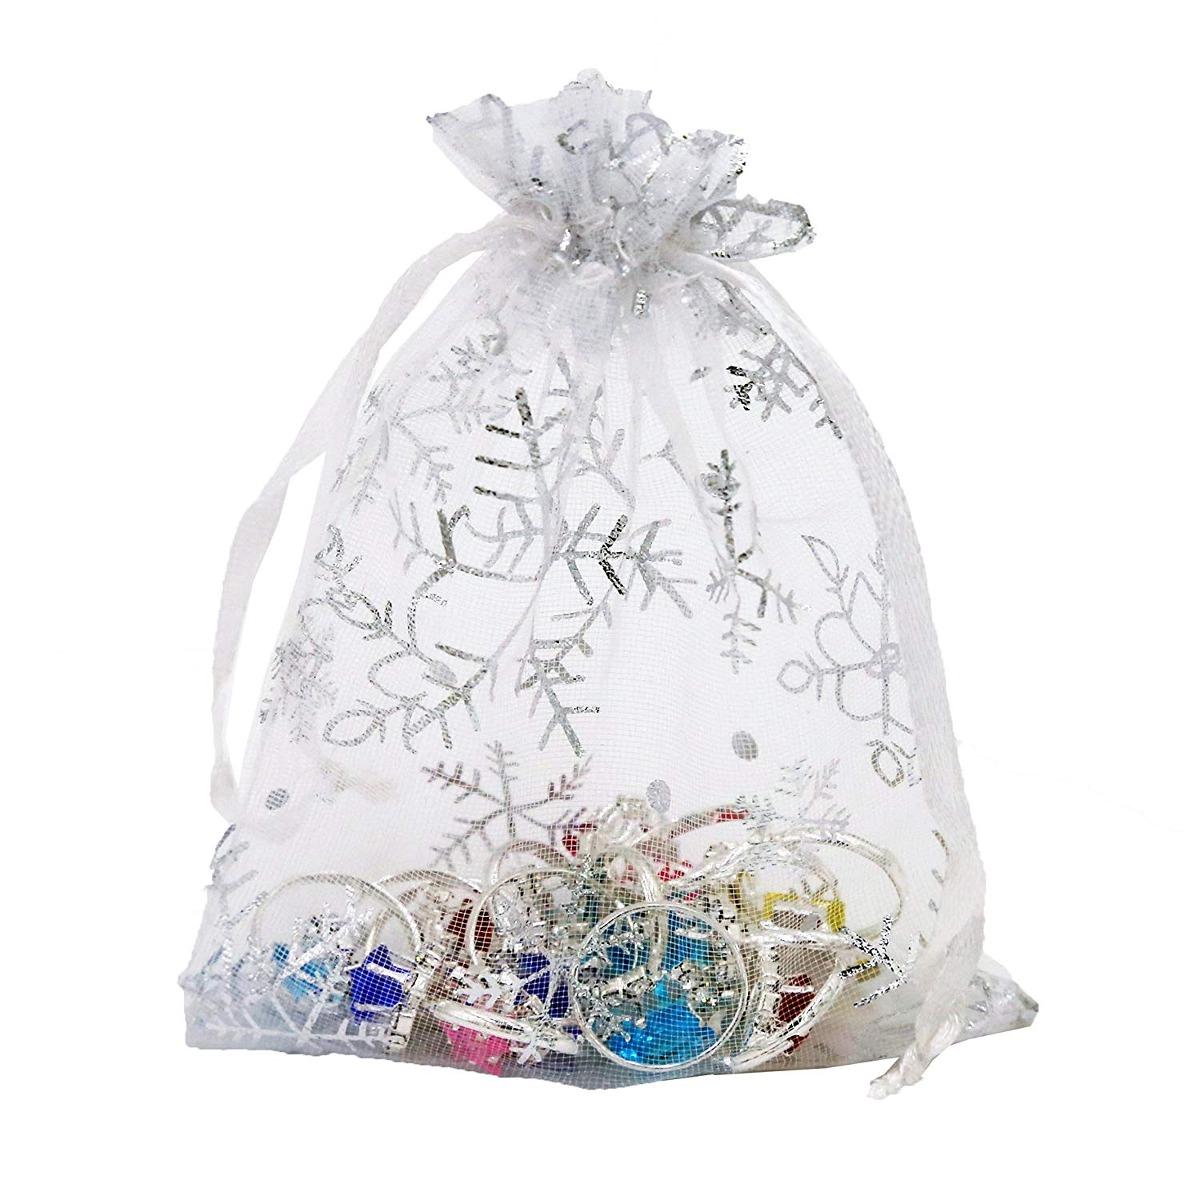 Wuli 100 Pcs Snow White Organza Gift Bags With Drawstrin